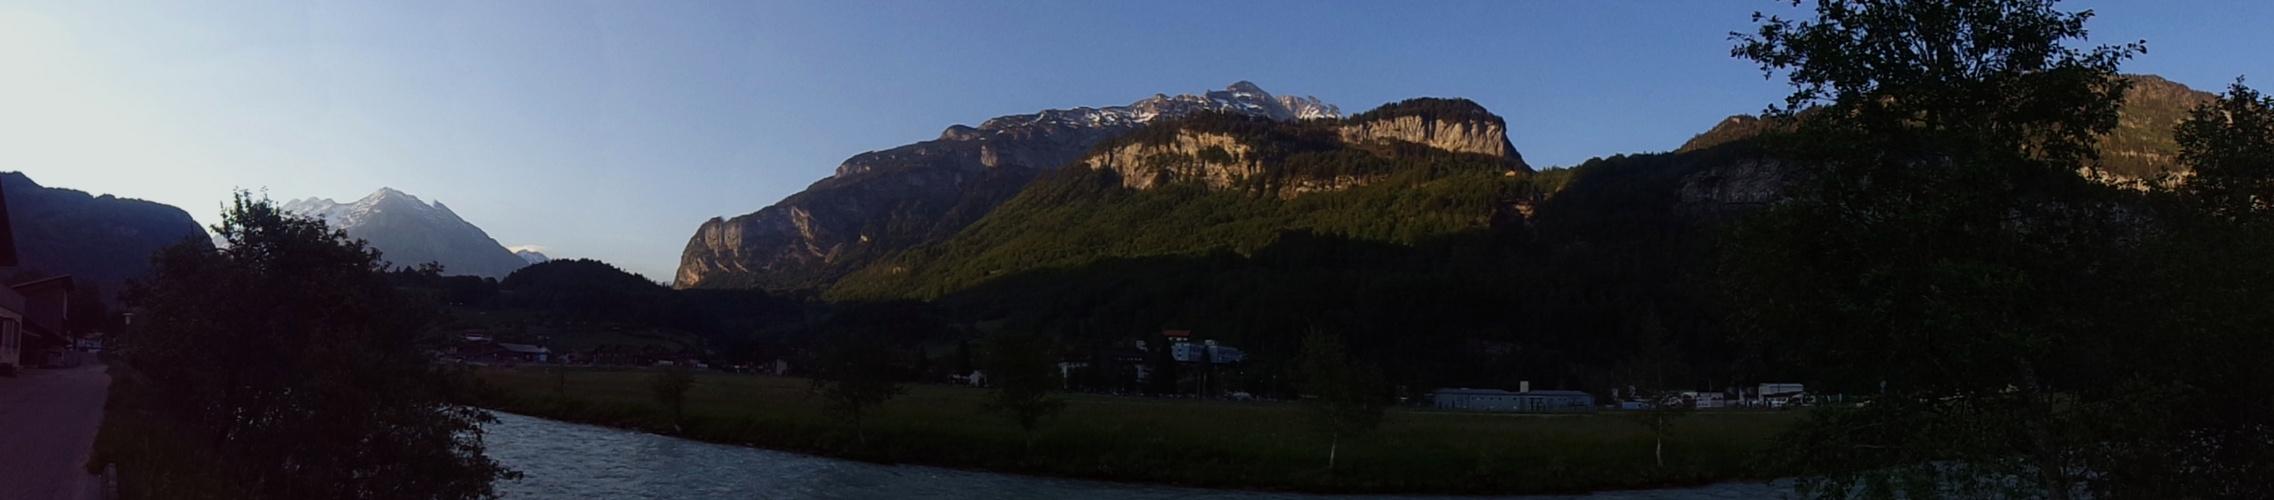 Panorama Foto mit Bergen